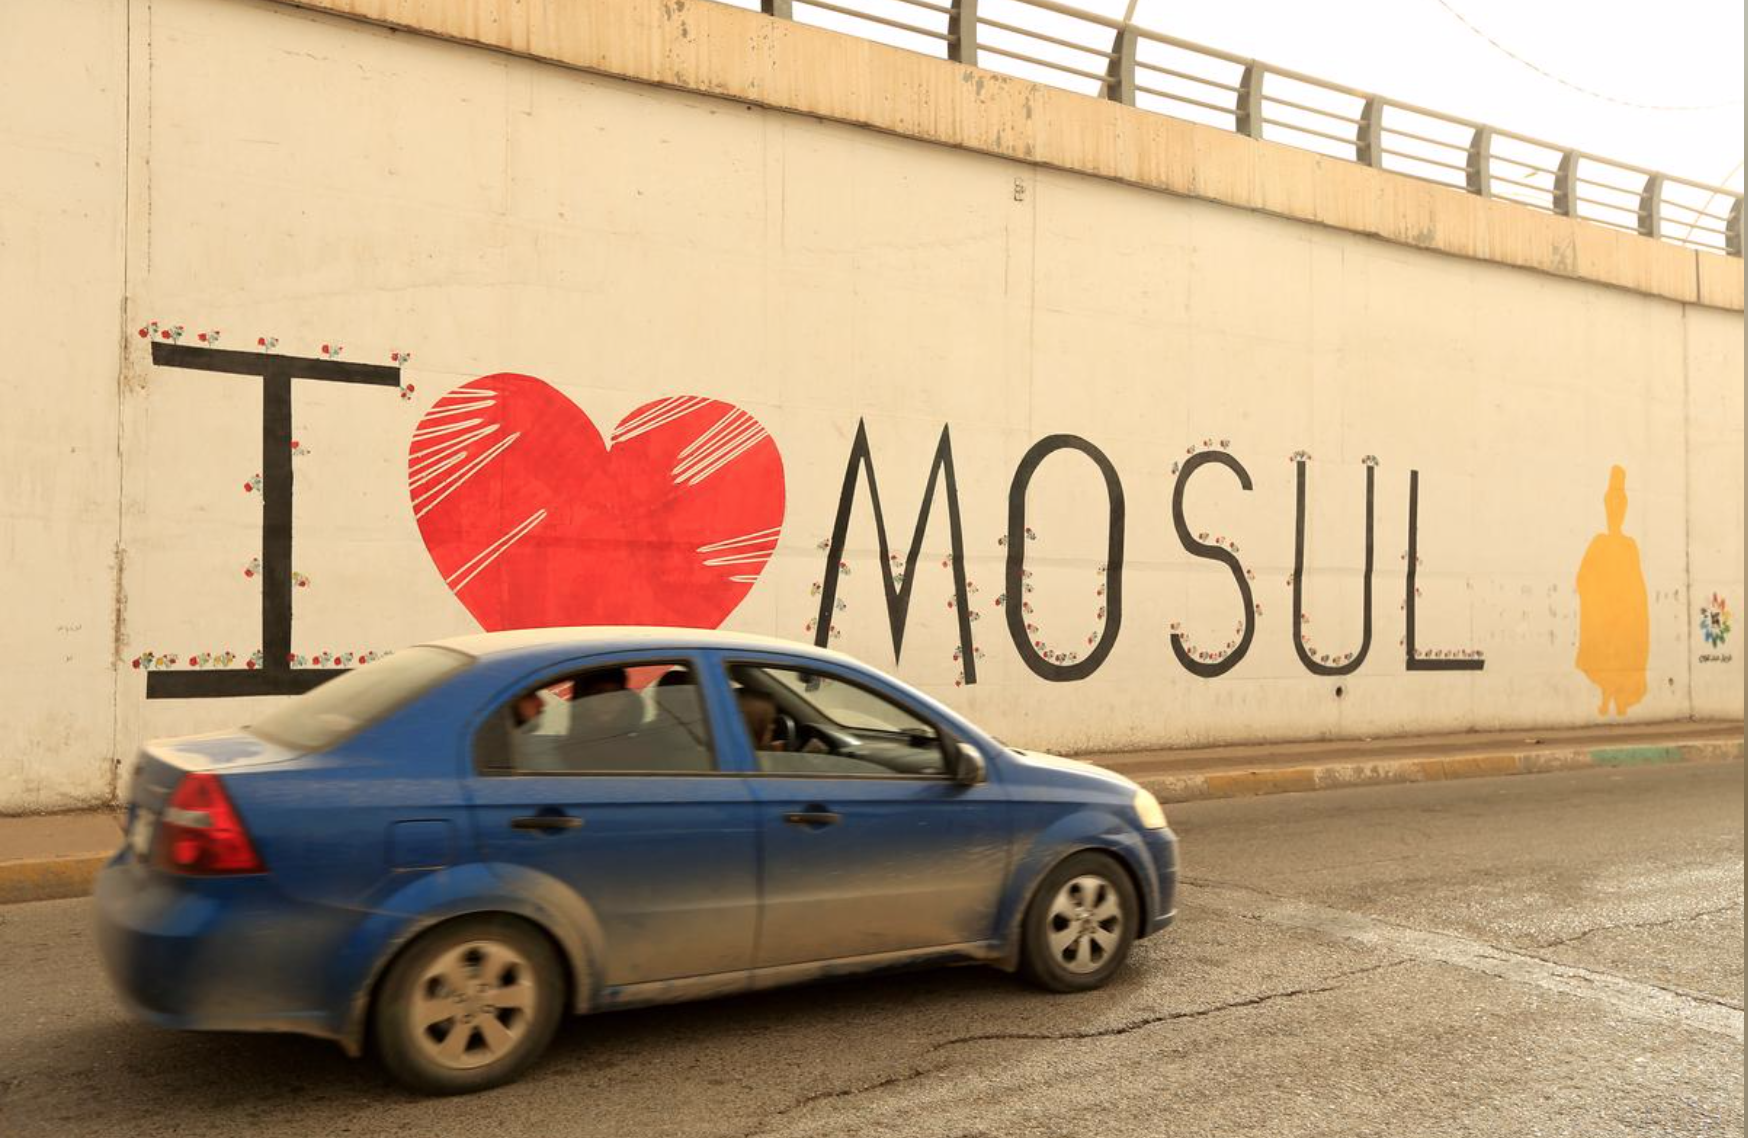 Iraqi Shi'ite groups deepen control in strategic Sunni areas